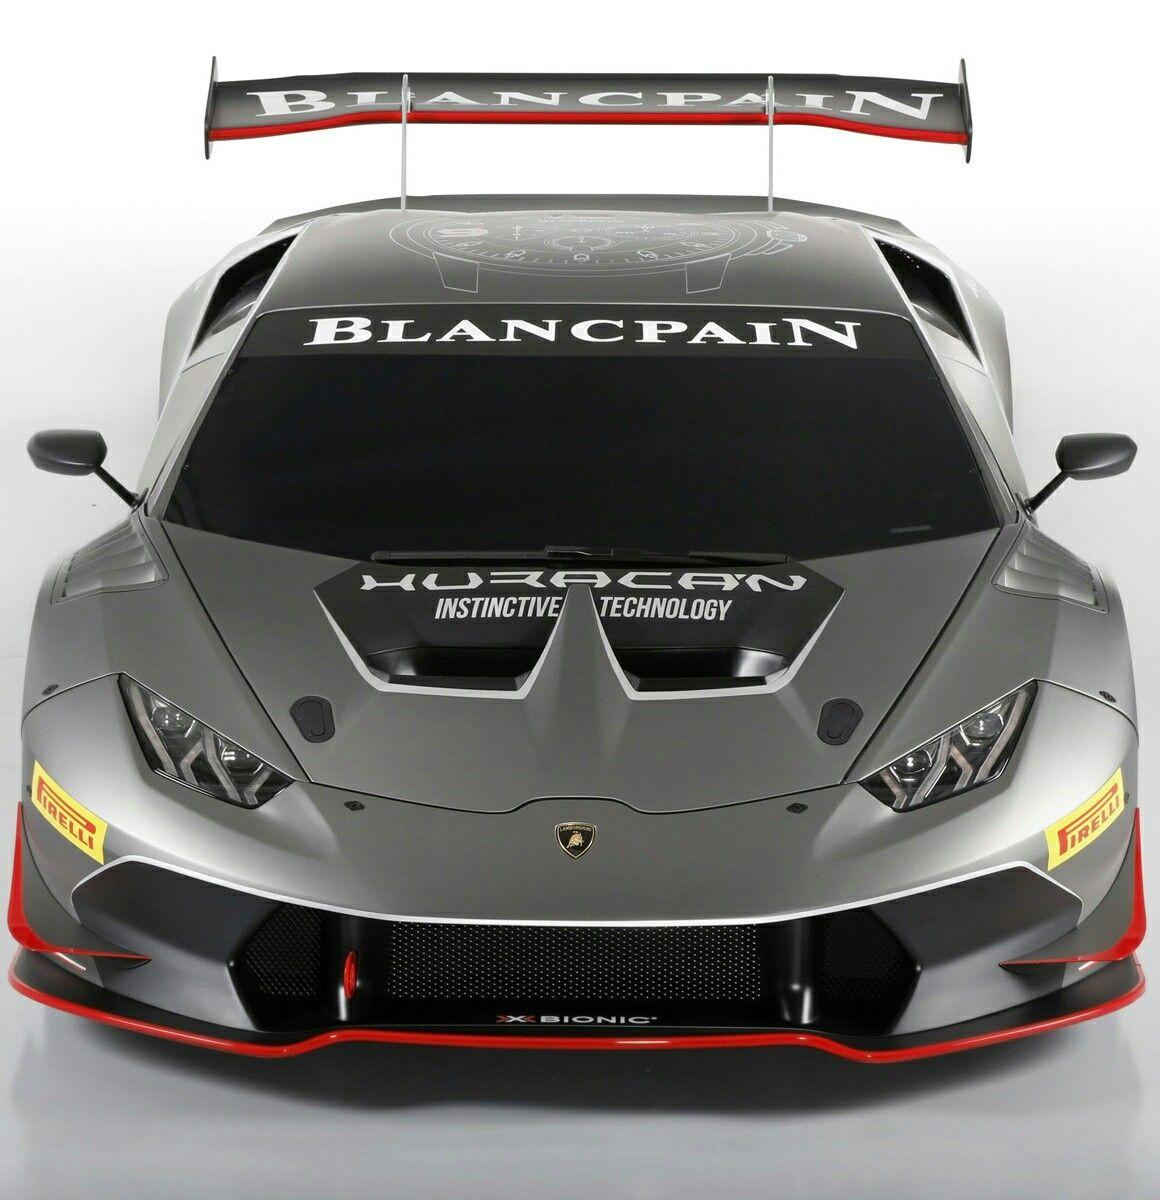 2015 Lamborghini Huracan LP620 2 Super Trofeo · ModelLpsLuxury Sports  CarsTop 10 ...